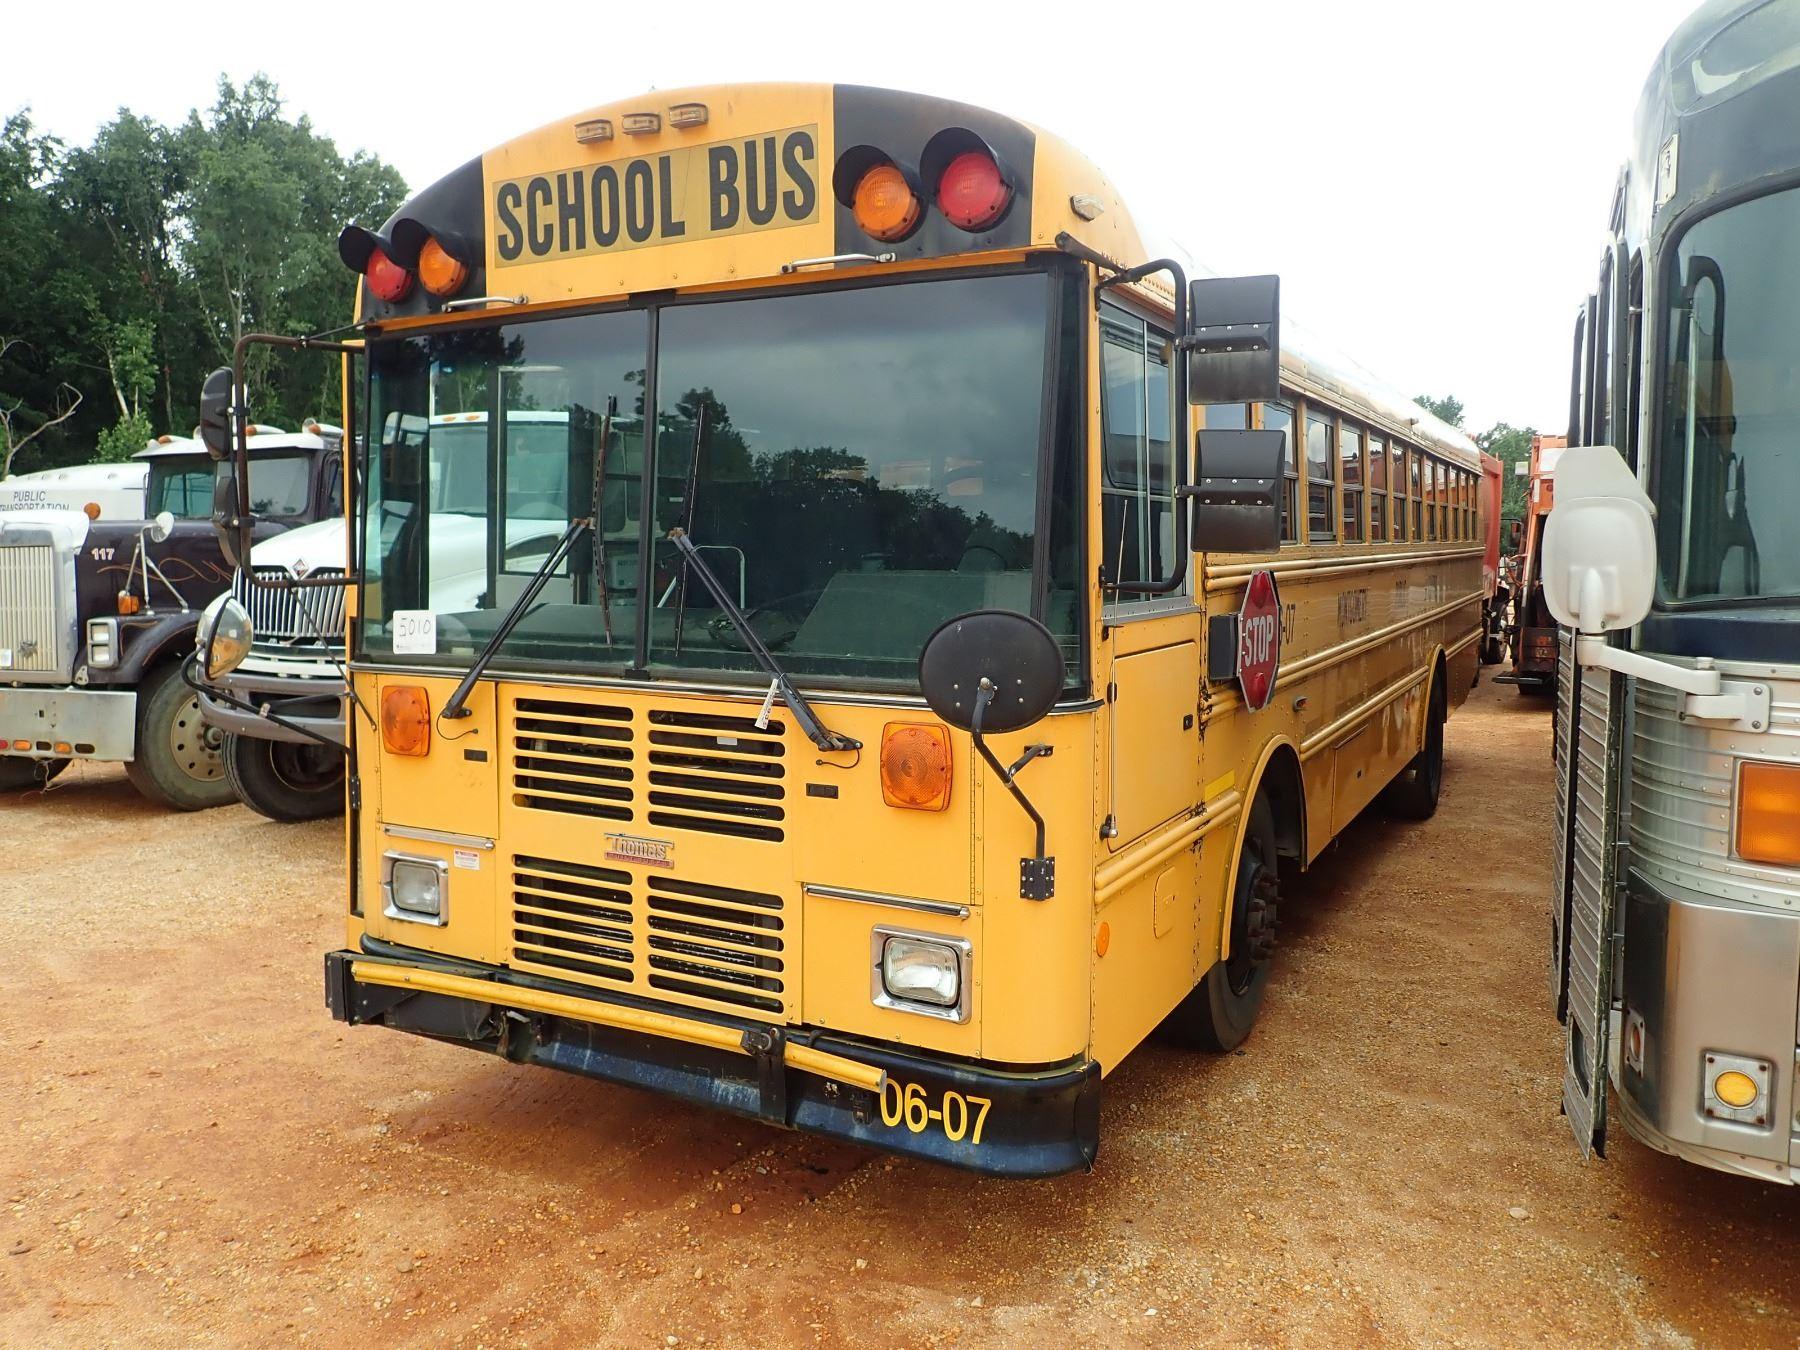 2006 THOMAS SCHOOL BUS, VIN/SN:1T88N3C2261164595 - DIESEL ENGINE, A/T, 48  PASSENGER (COUNTY OWNED)